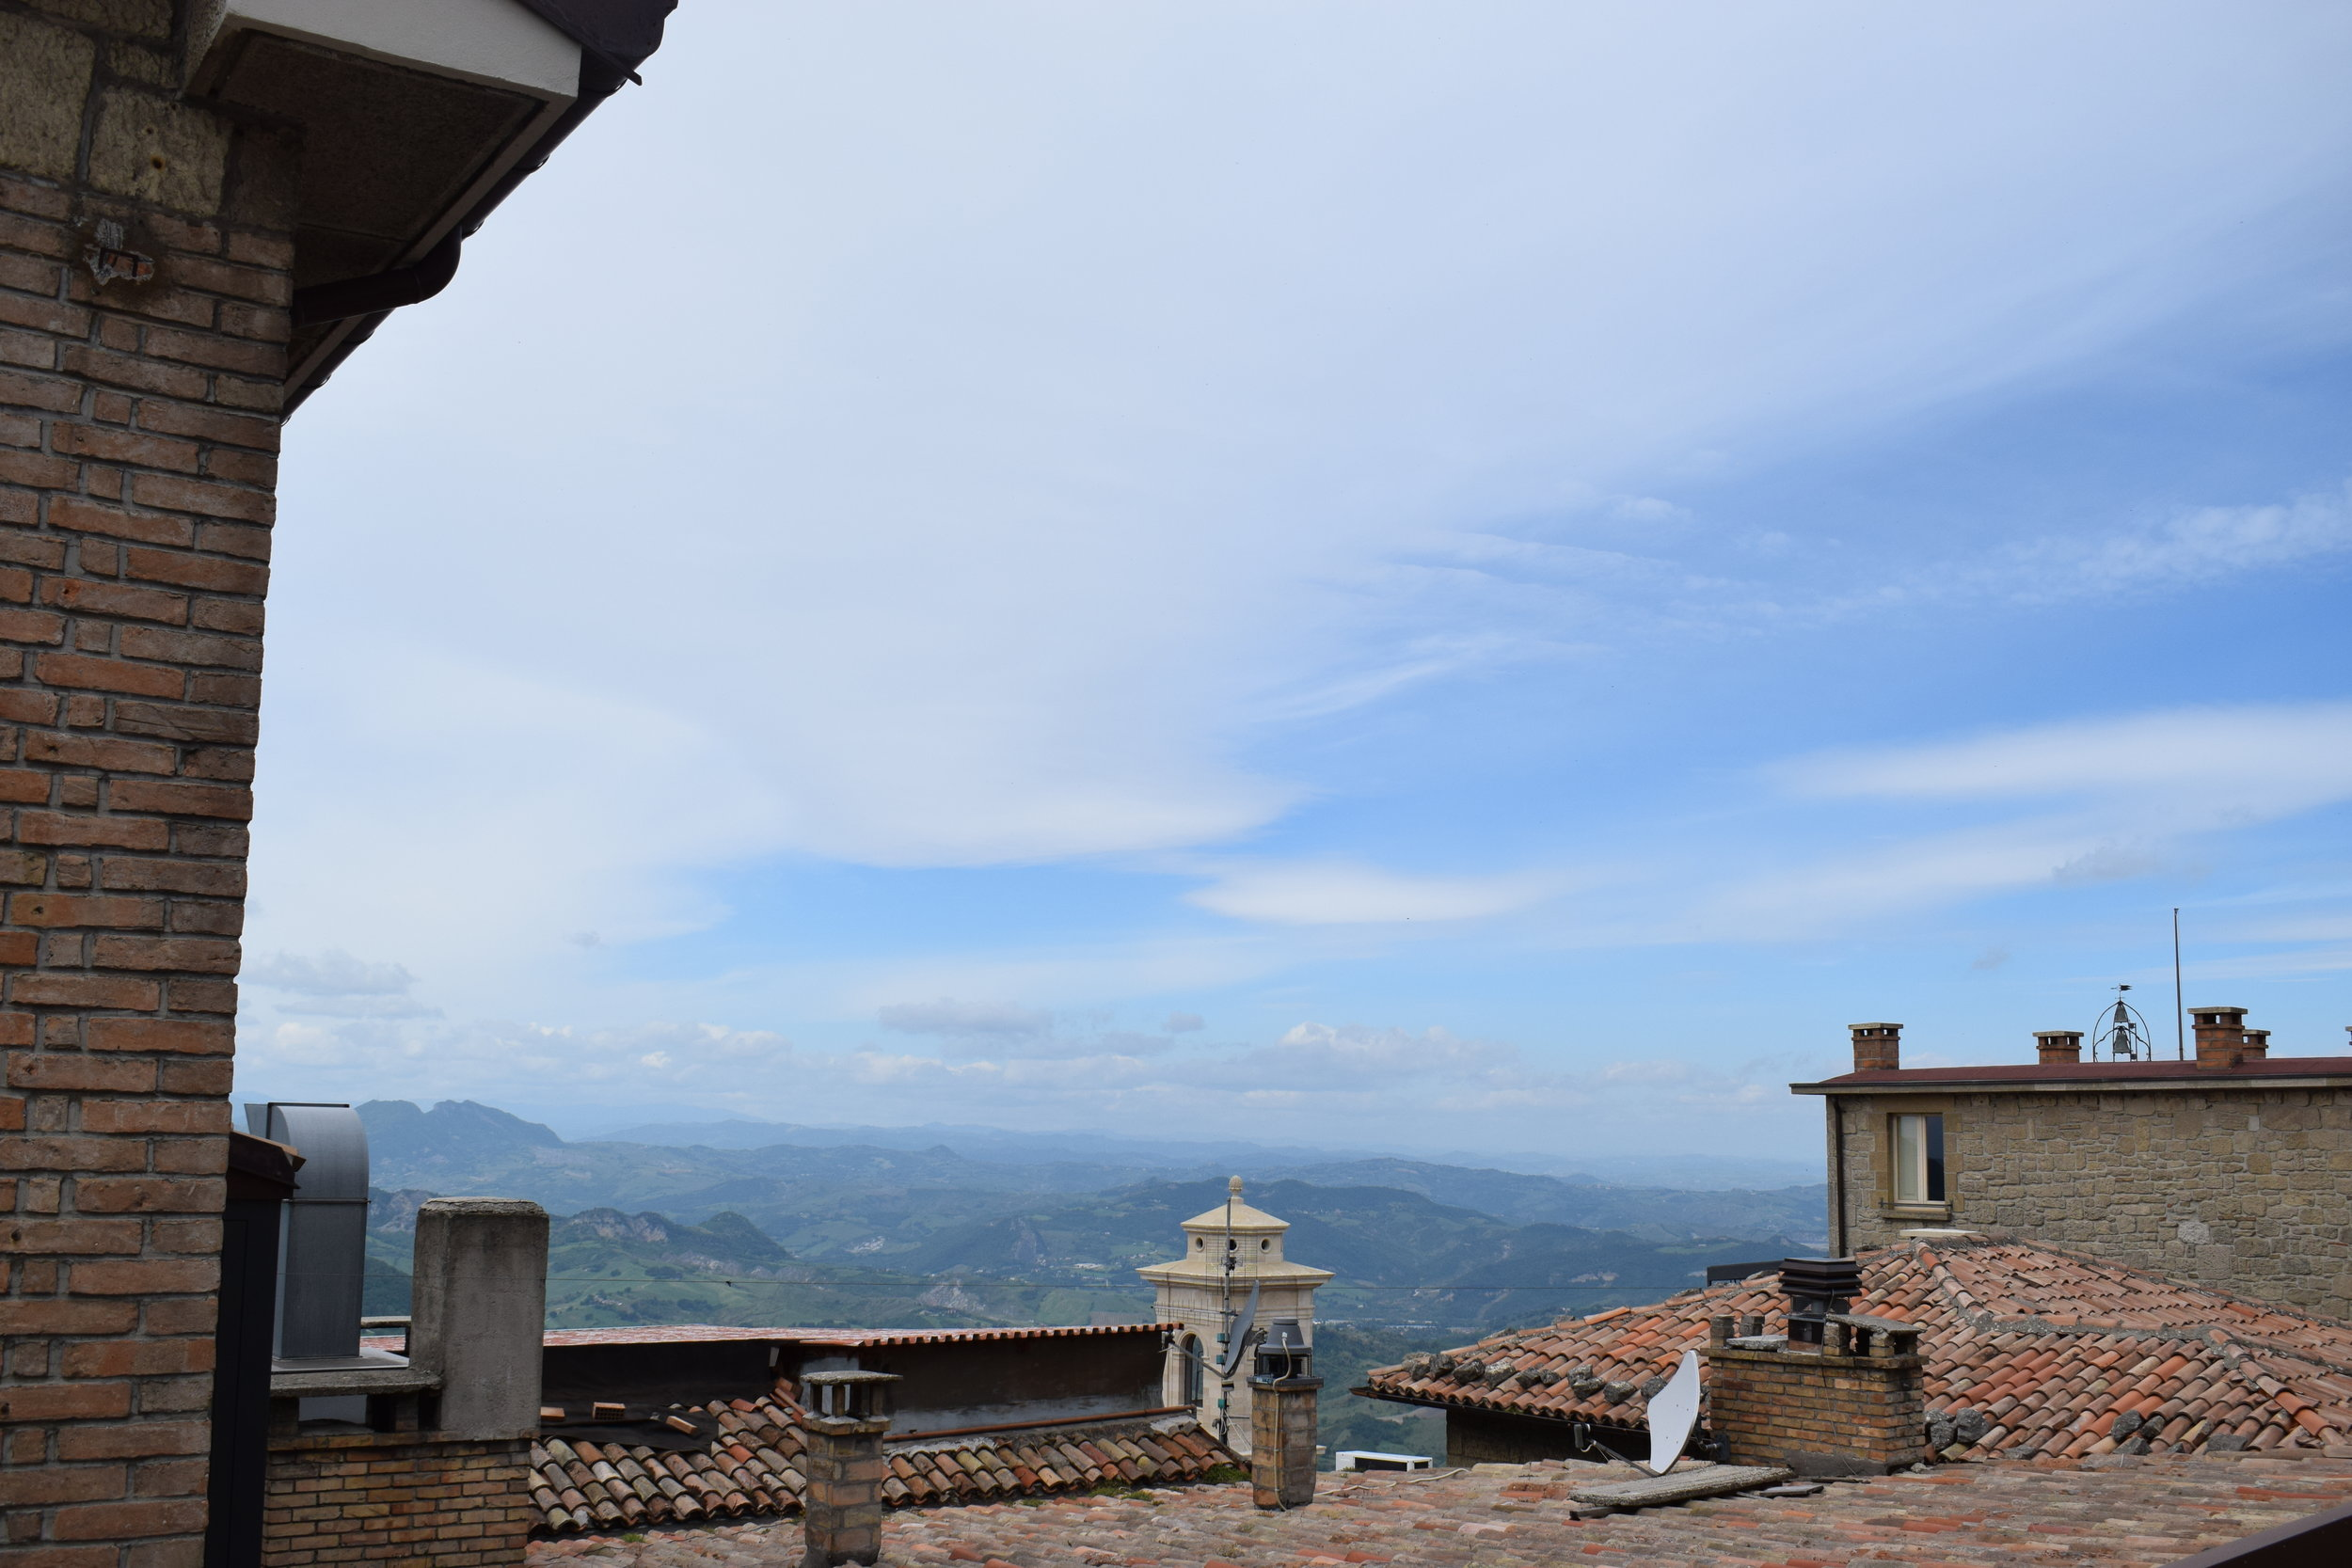 San-Marino-Rooftops-View